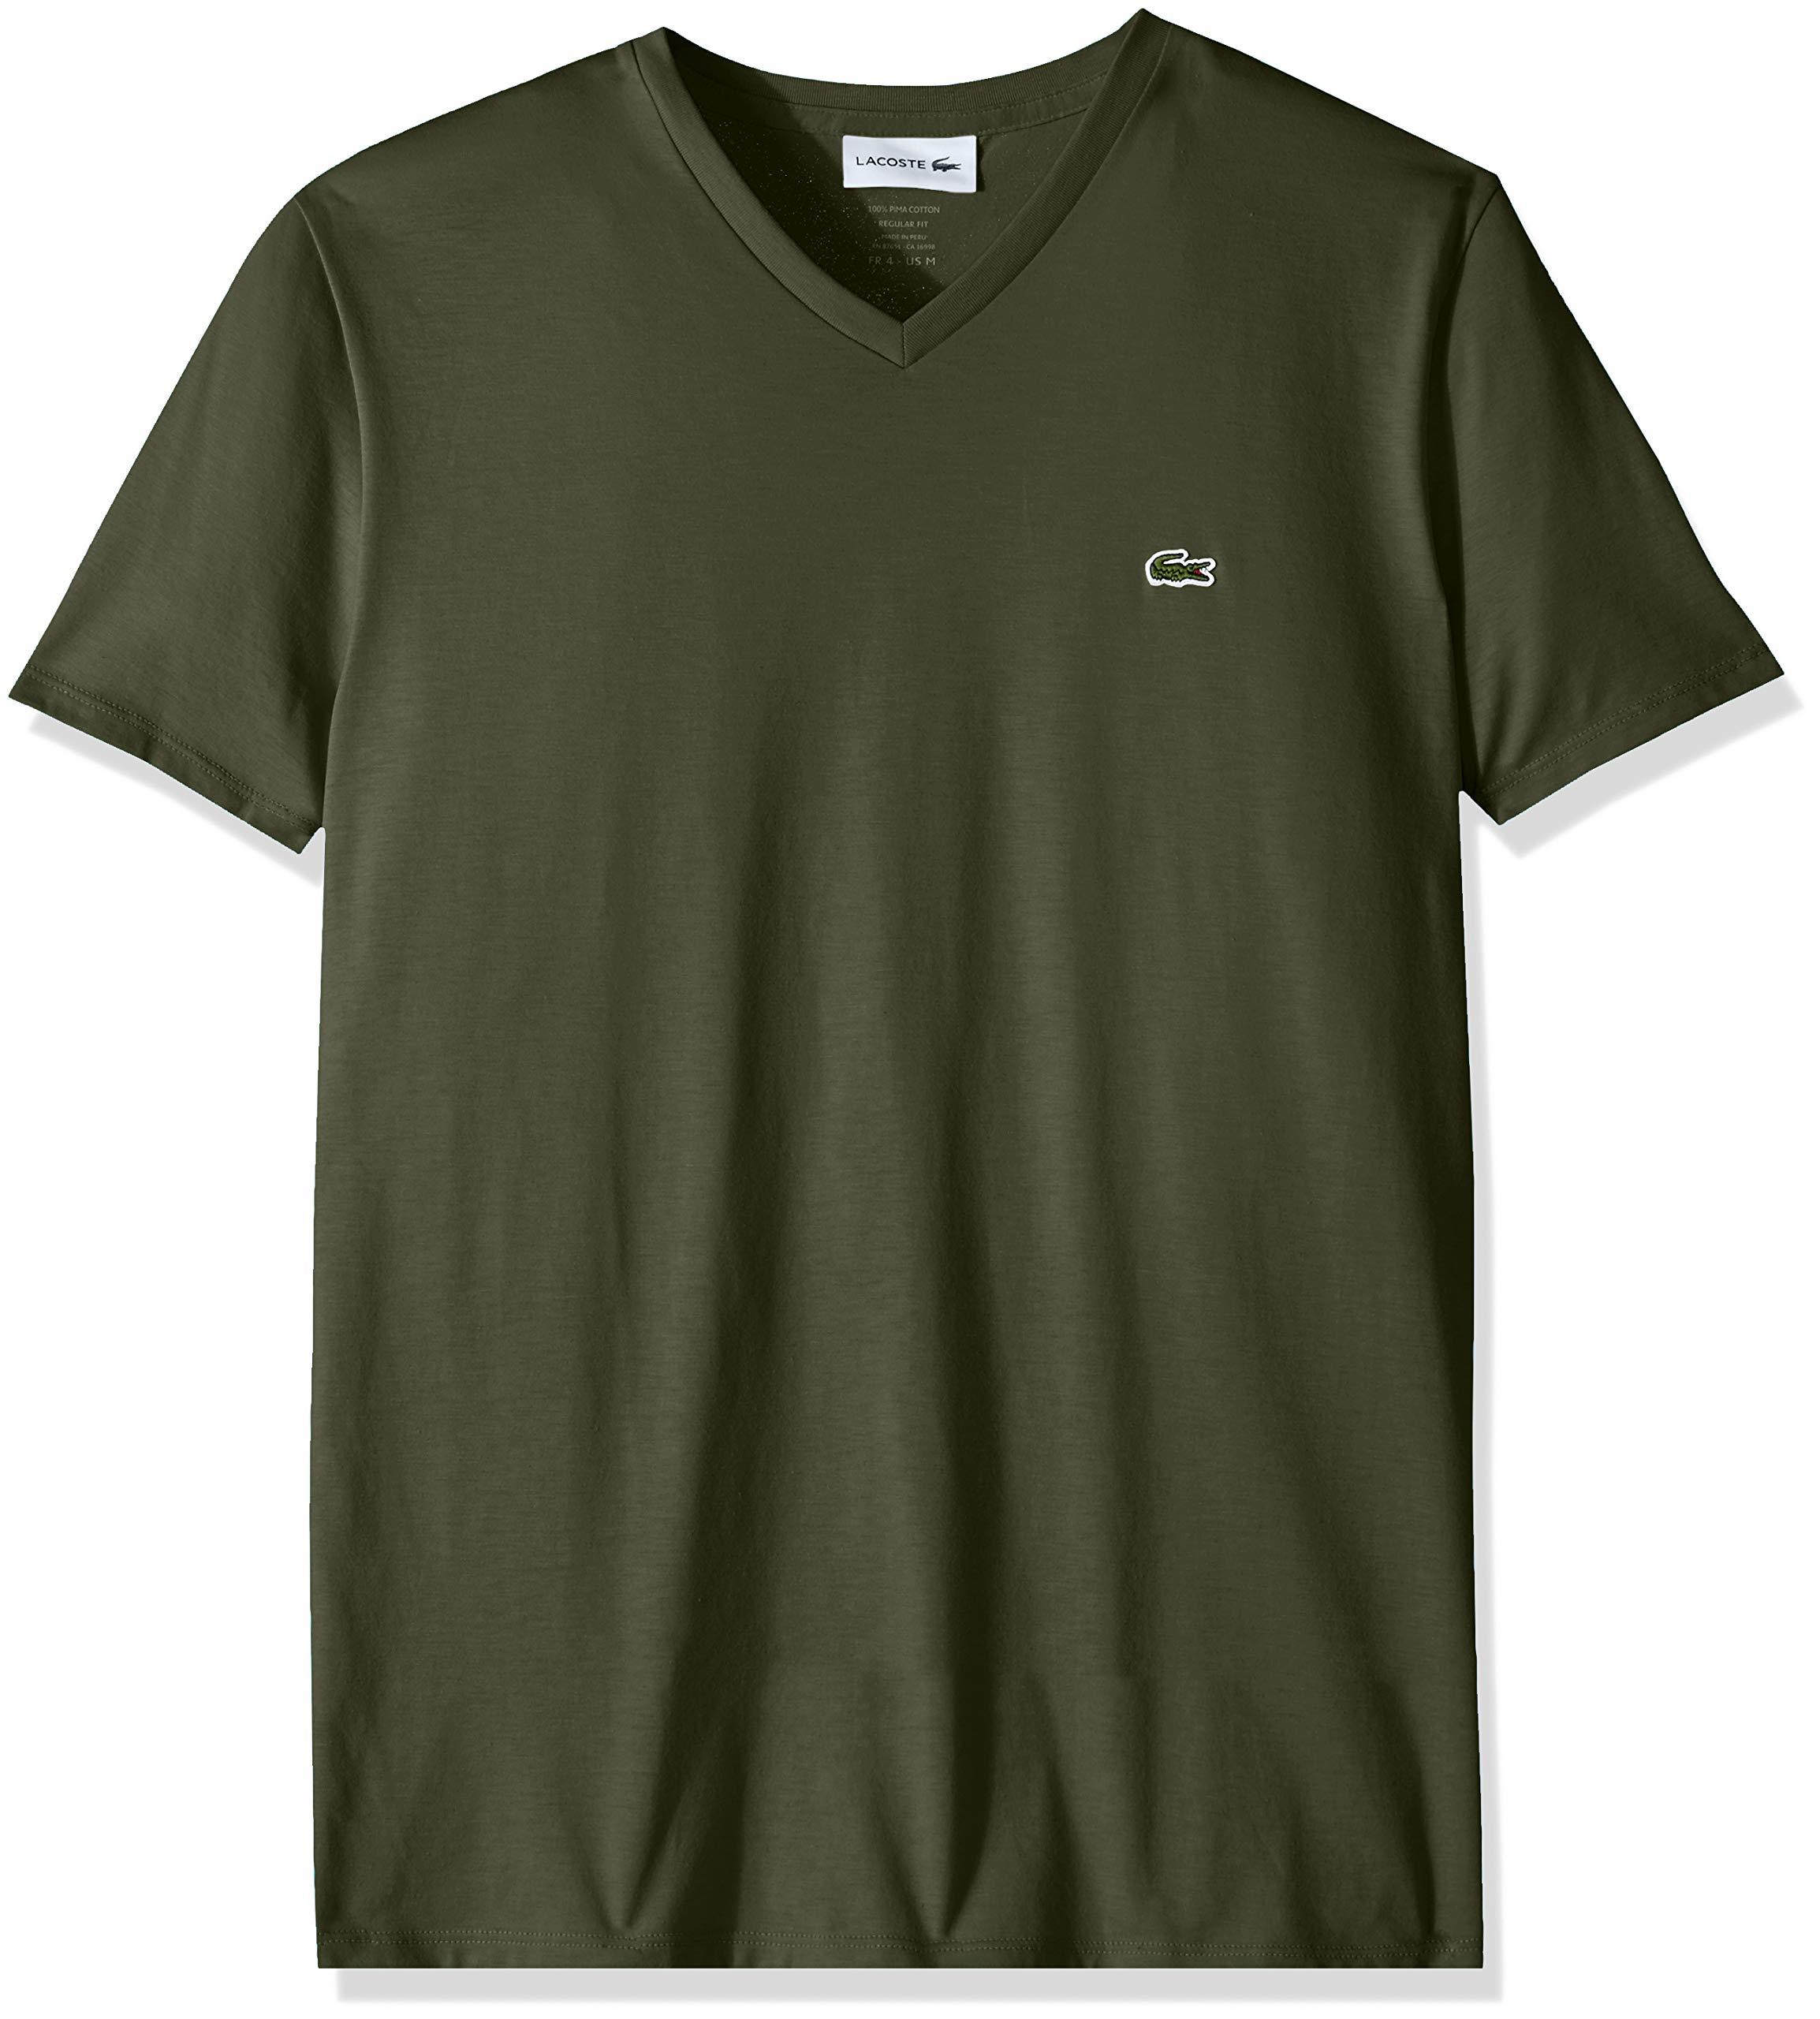 Lacoste Men's S/S V Neck PIMA Jersey T-Shirt, Caper